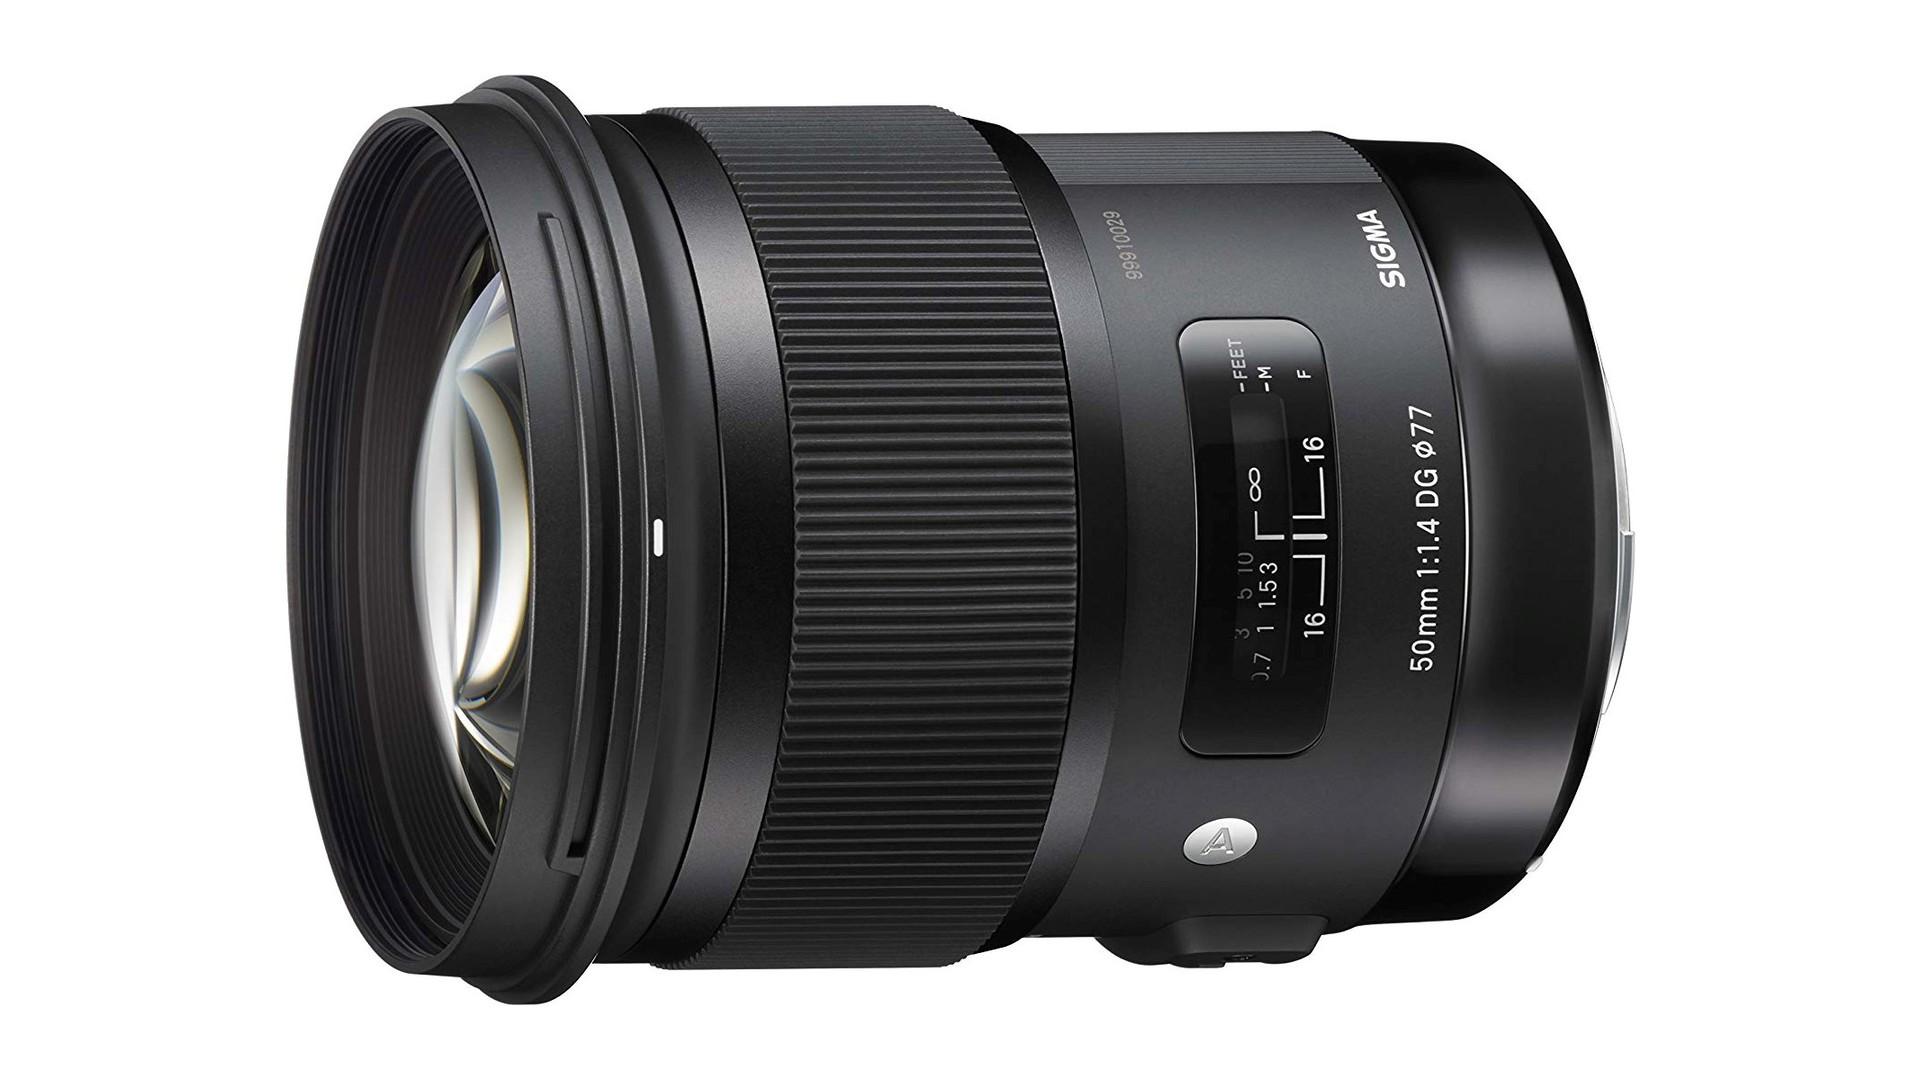 Sigma 50mm f1.4 DG HSM - The best dslr lenses